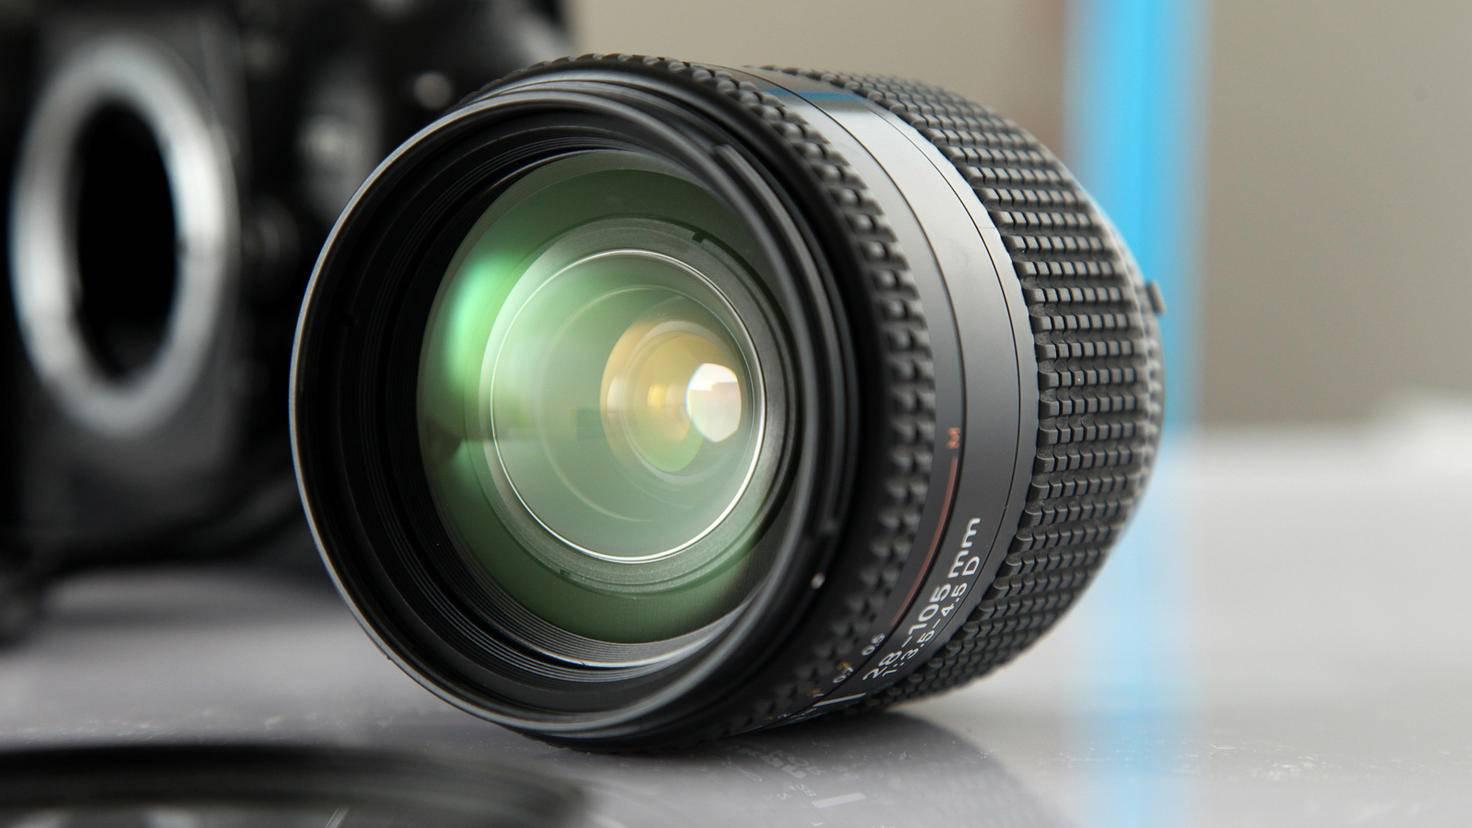 Objektiv Linse Spiegelreflexkamera